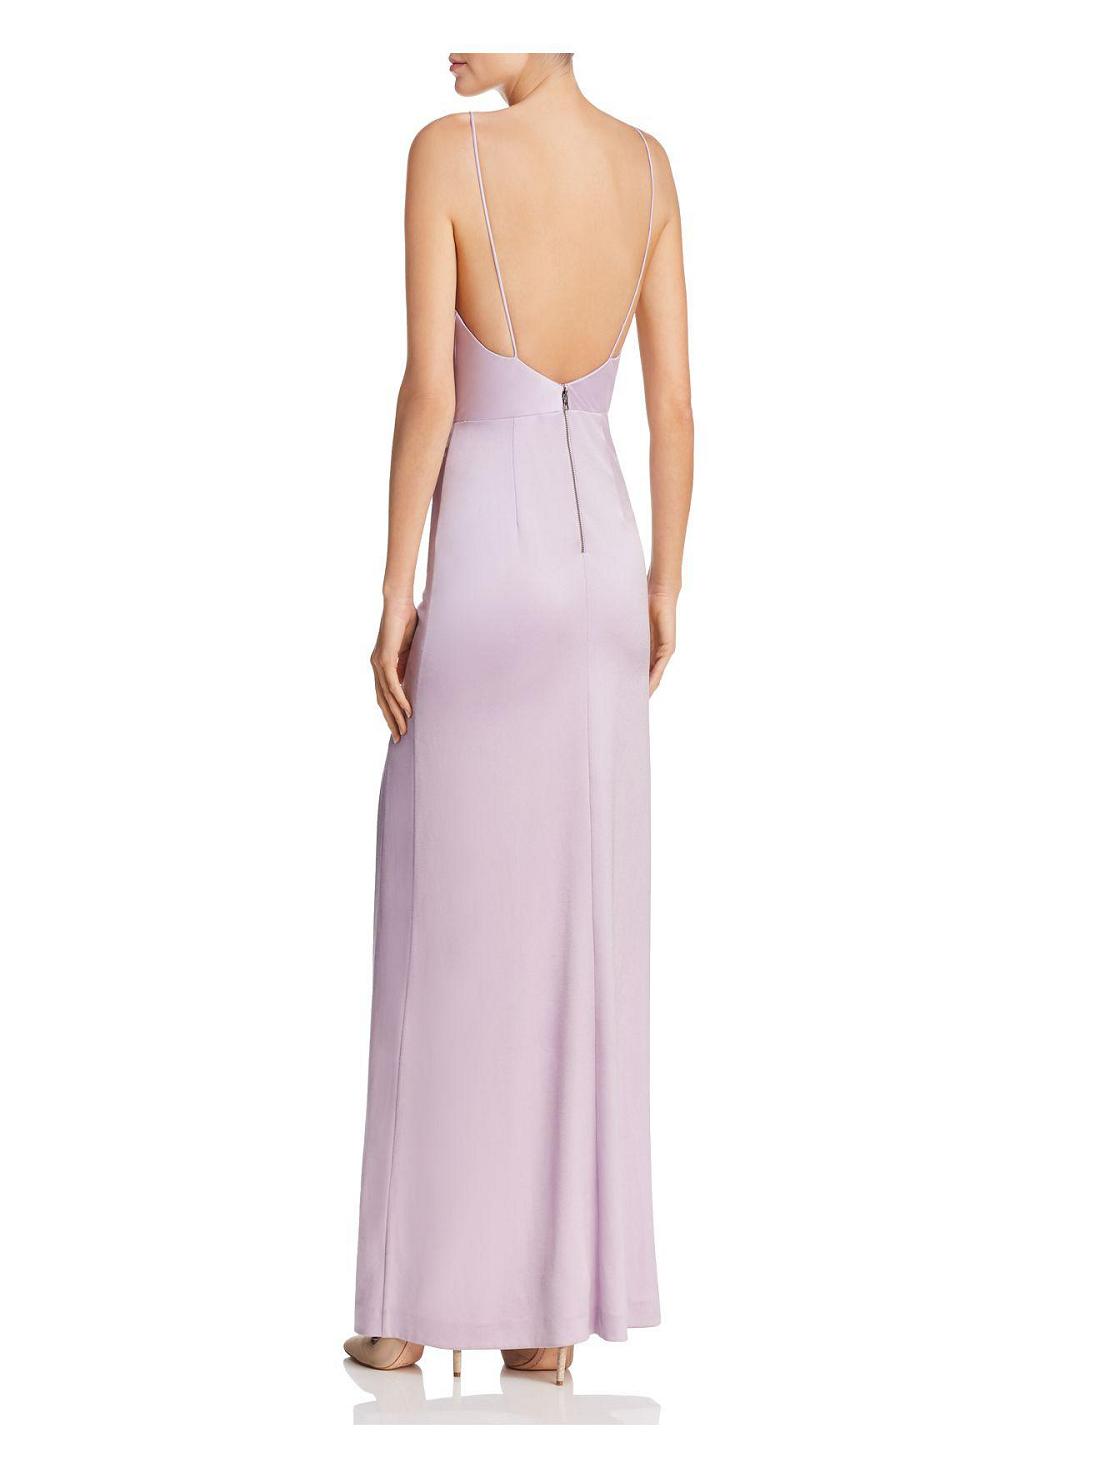 4 Wholesale Satin Backless Dress